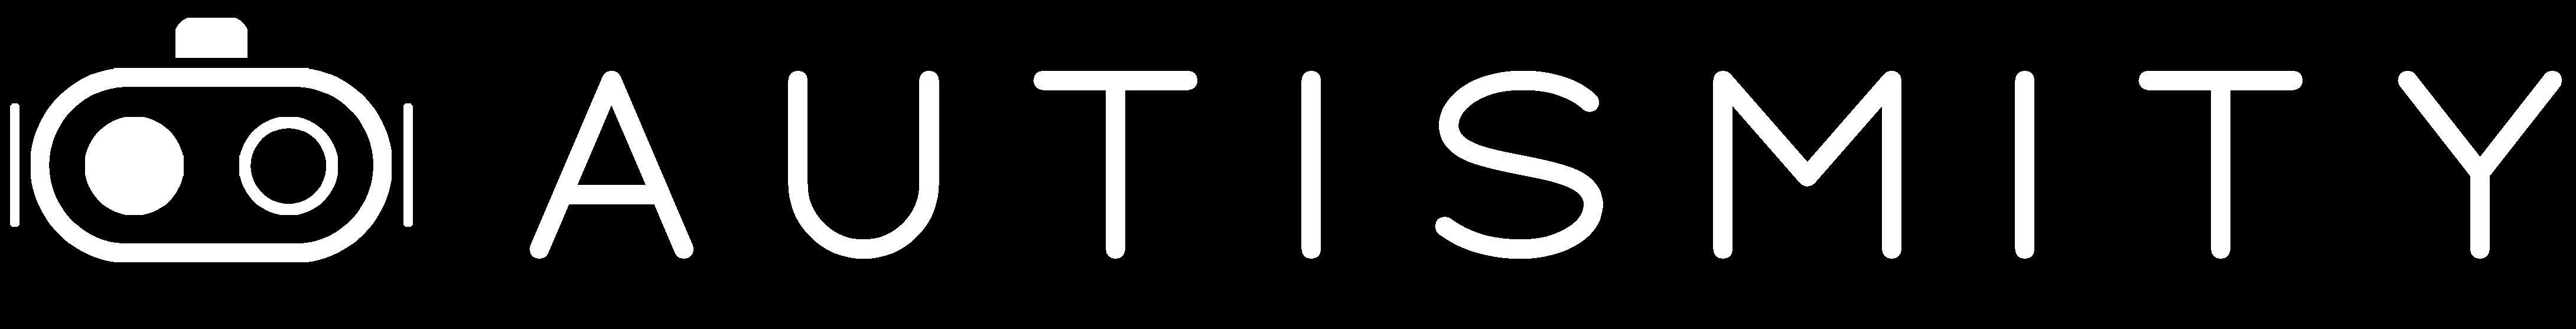 Autismity logo transparent